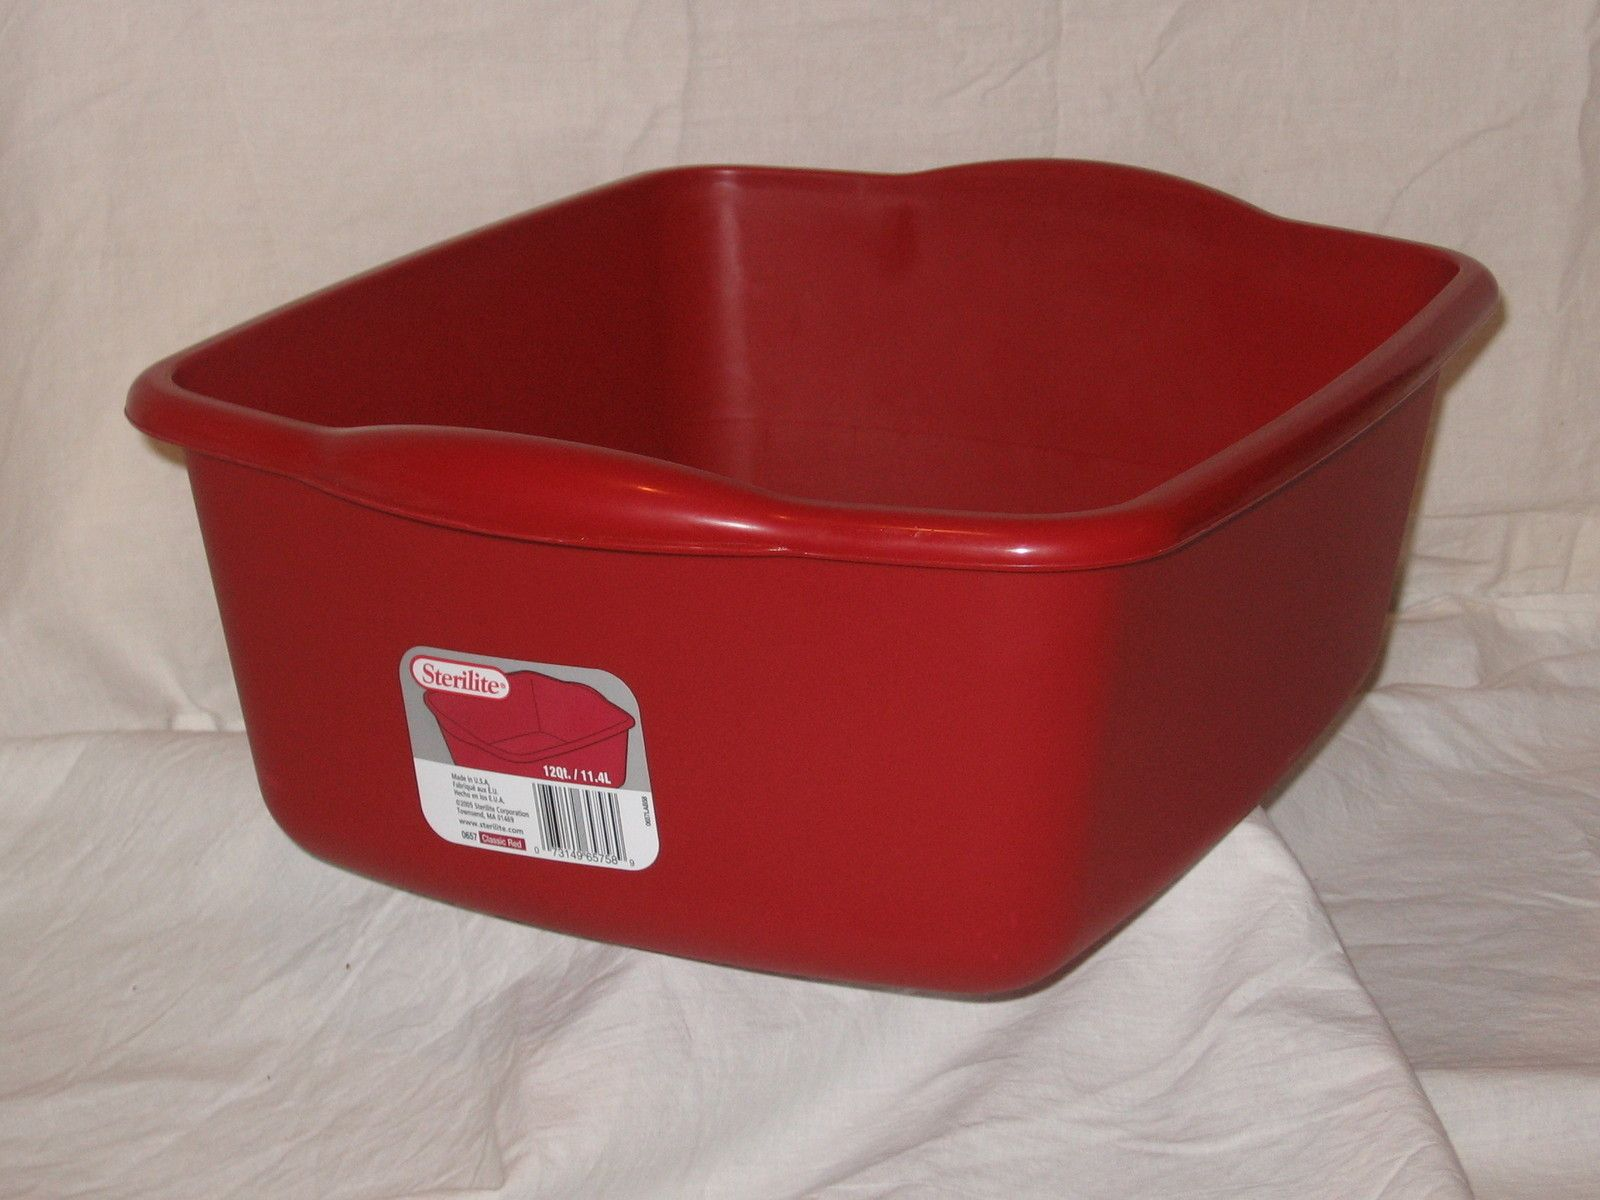 Irregular Red Kitchen Sterilite 12 Qt Plastic Sink Dish Pan Wash